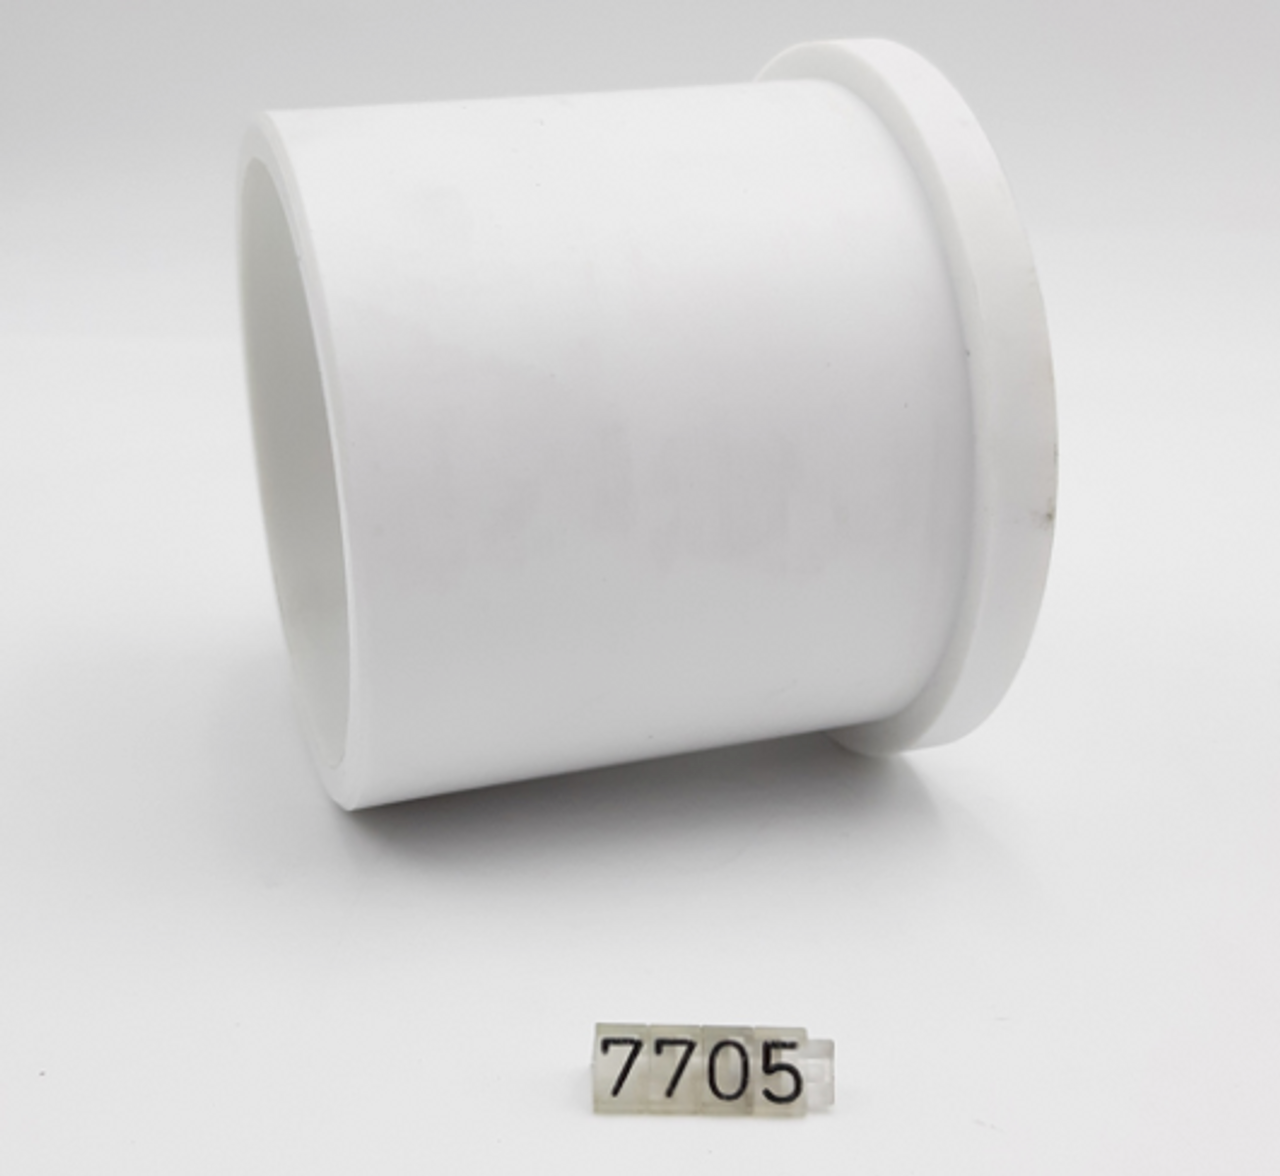 Talsa PH500 & PF500 - White Plastic Ring for Body  - 7705